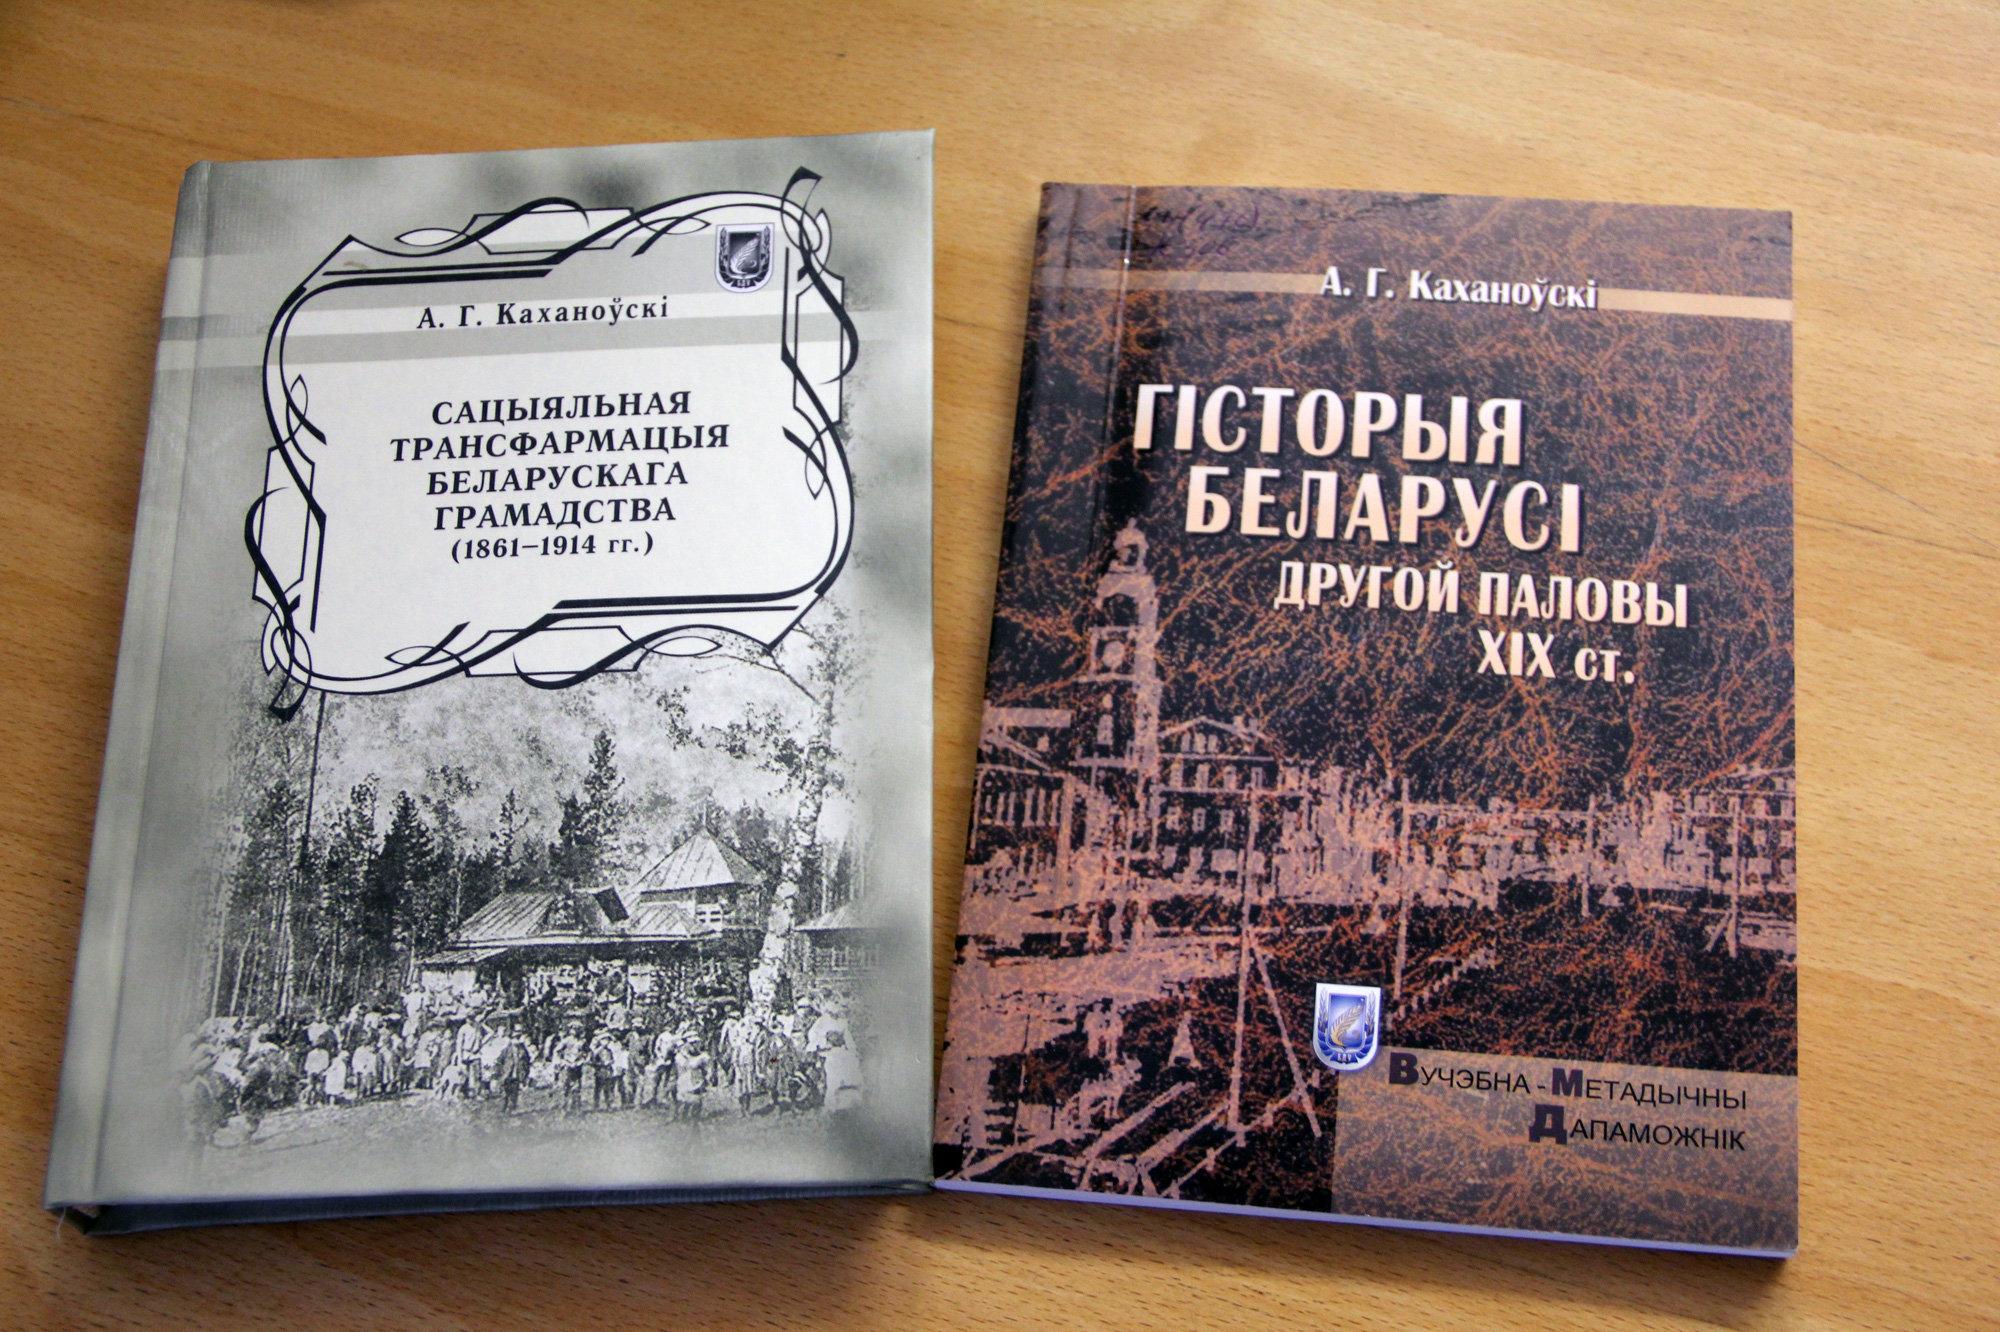 Книги Александра Кохановского